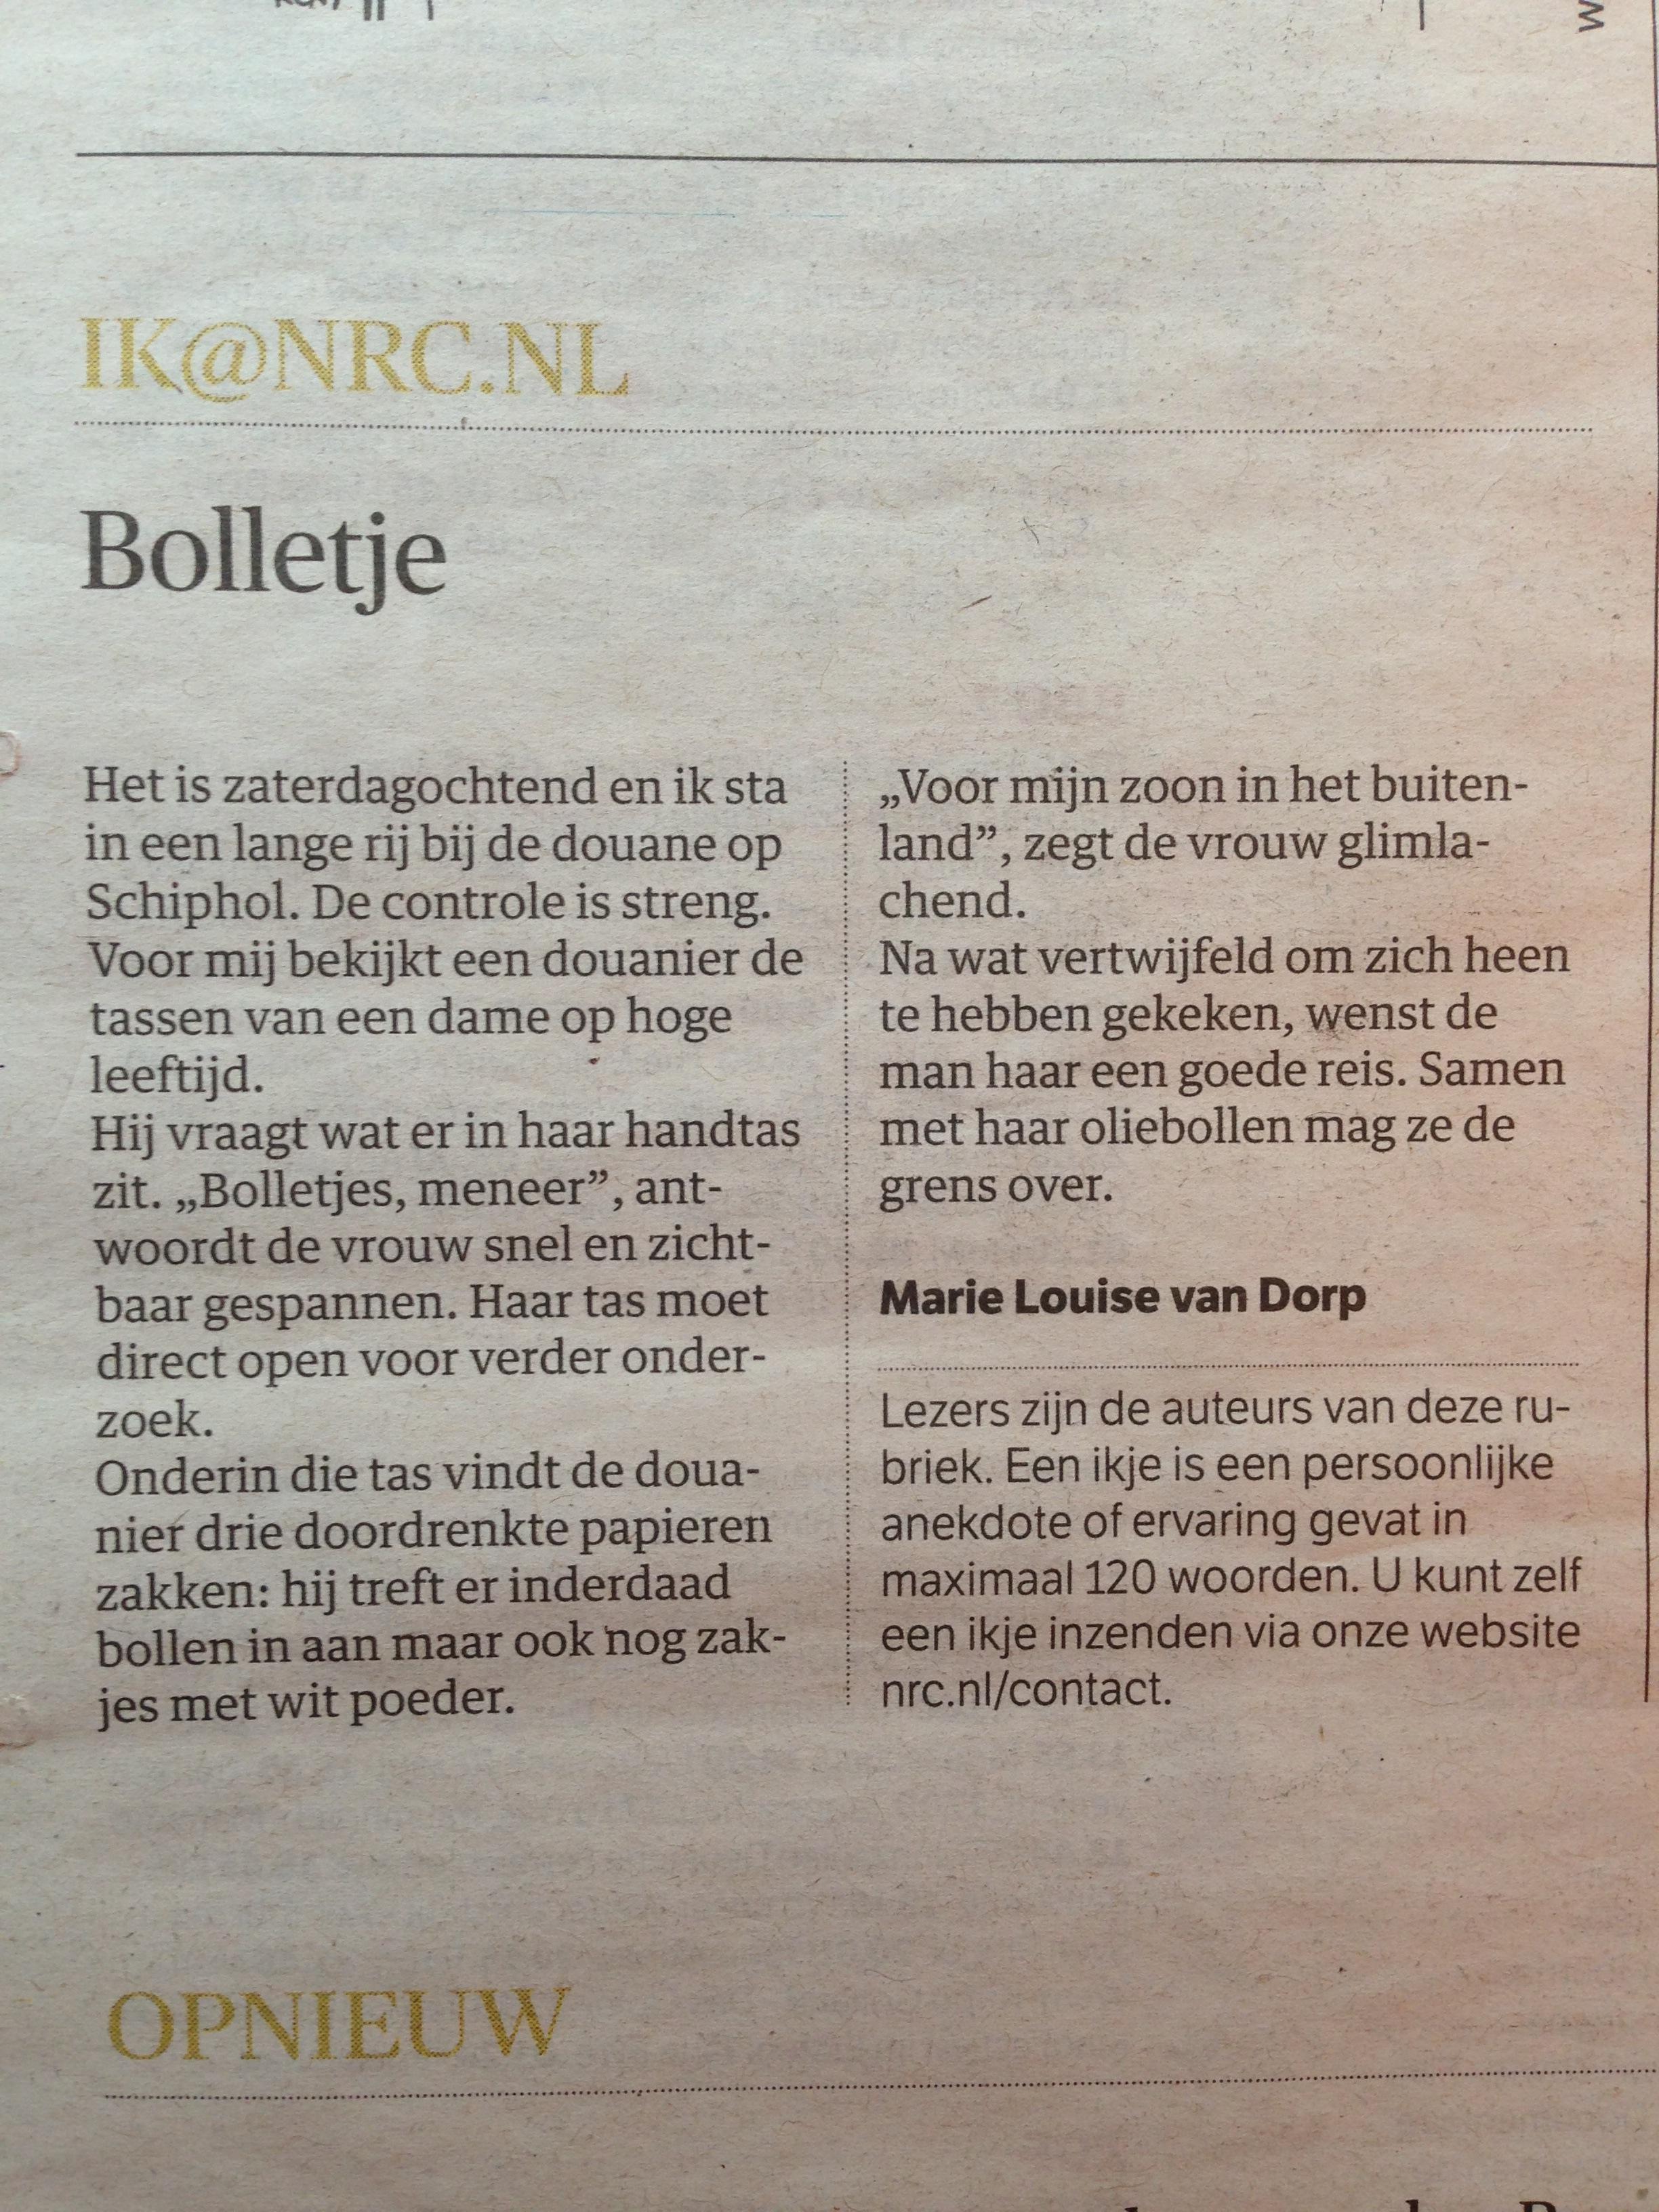 IKje NRC Marie Louise van Dorp